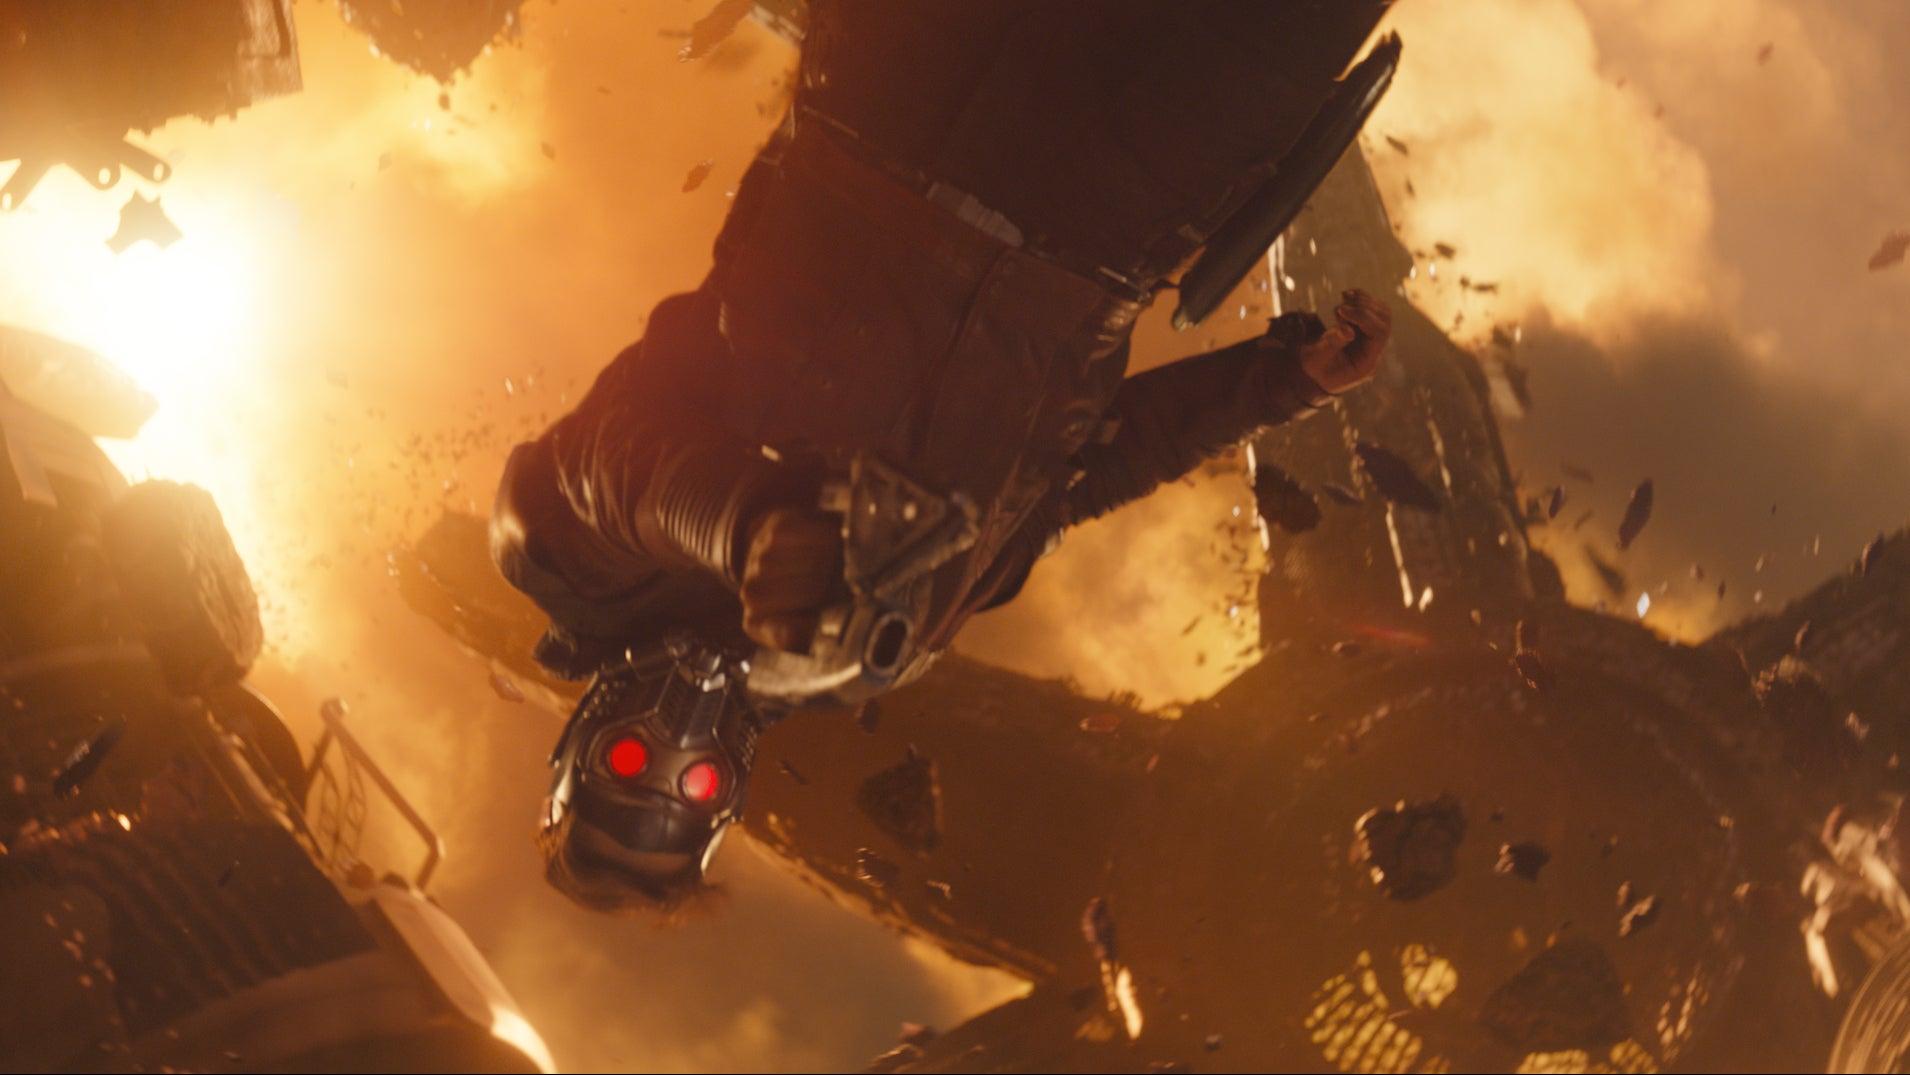 Chris Pratt Wants You To Cut Star-Lord Some Slack For ThatInfinity War Blunder, OK?